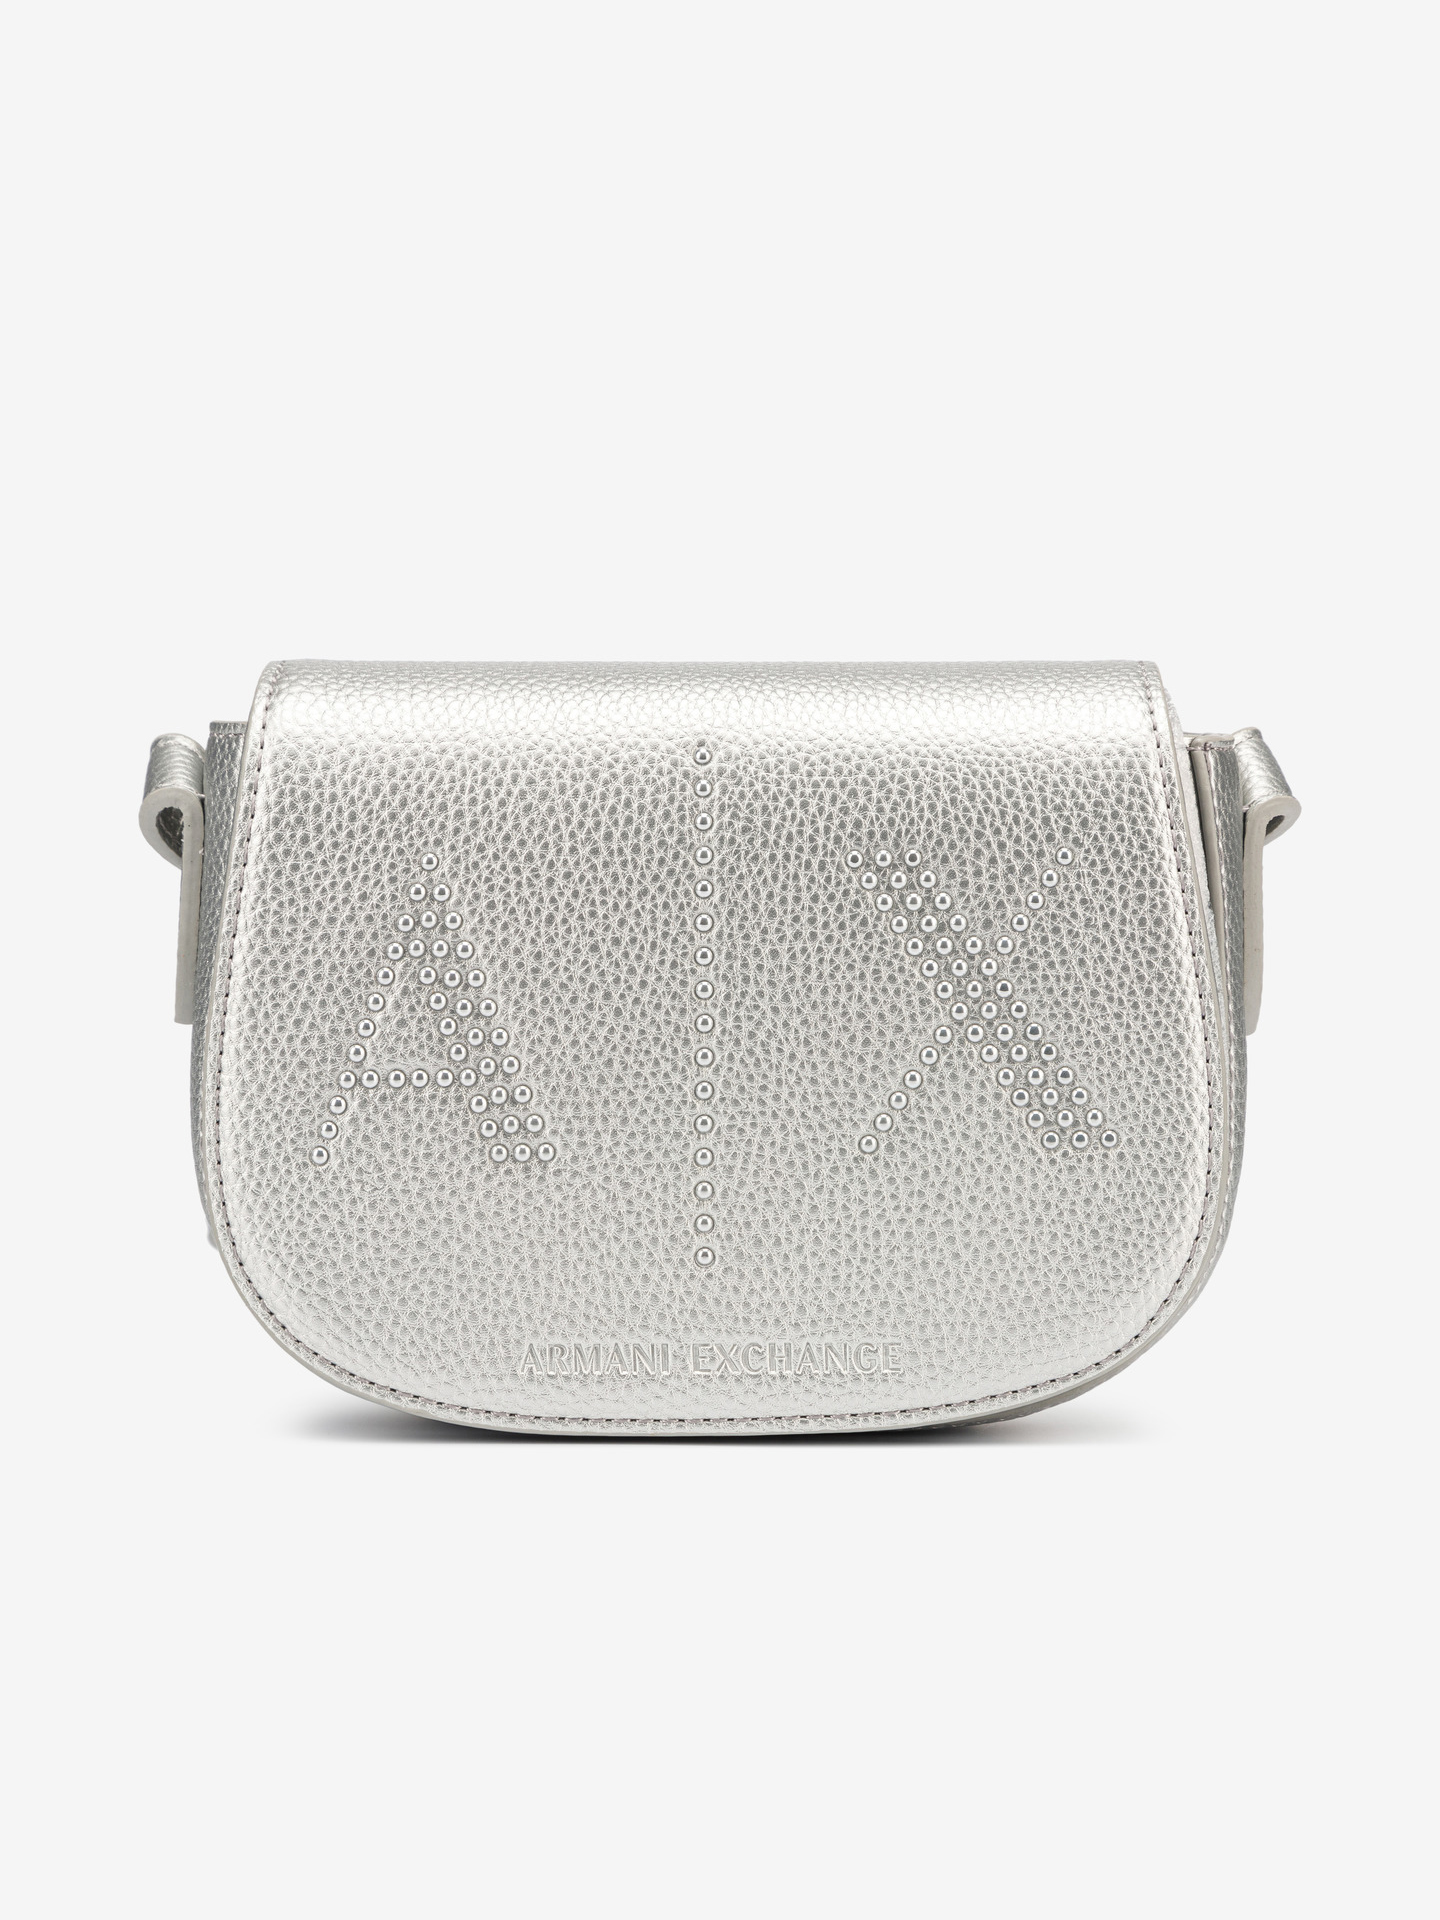 Armani Exchange argento borsetta